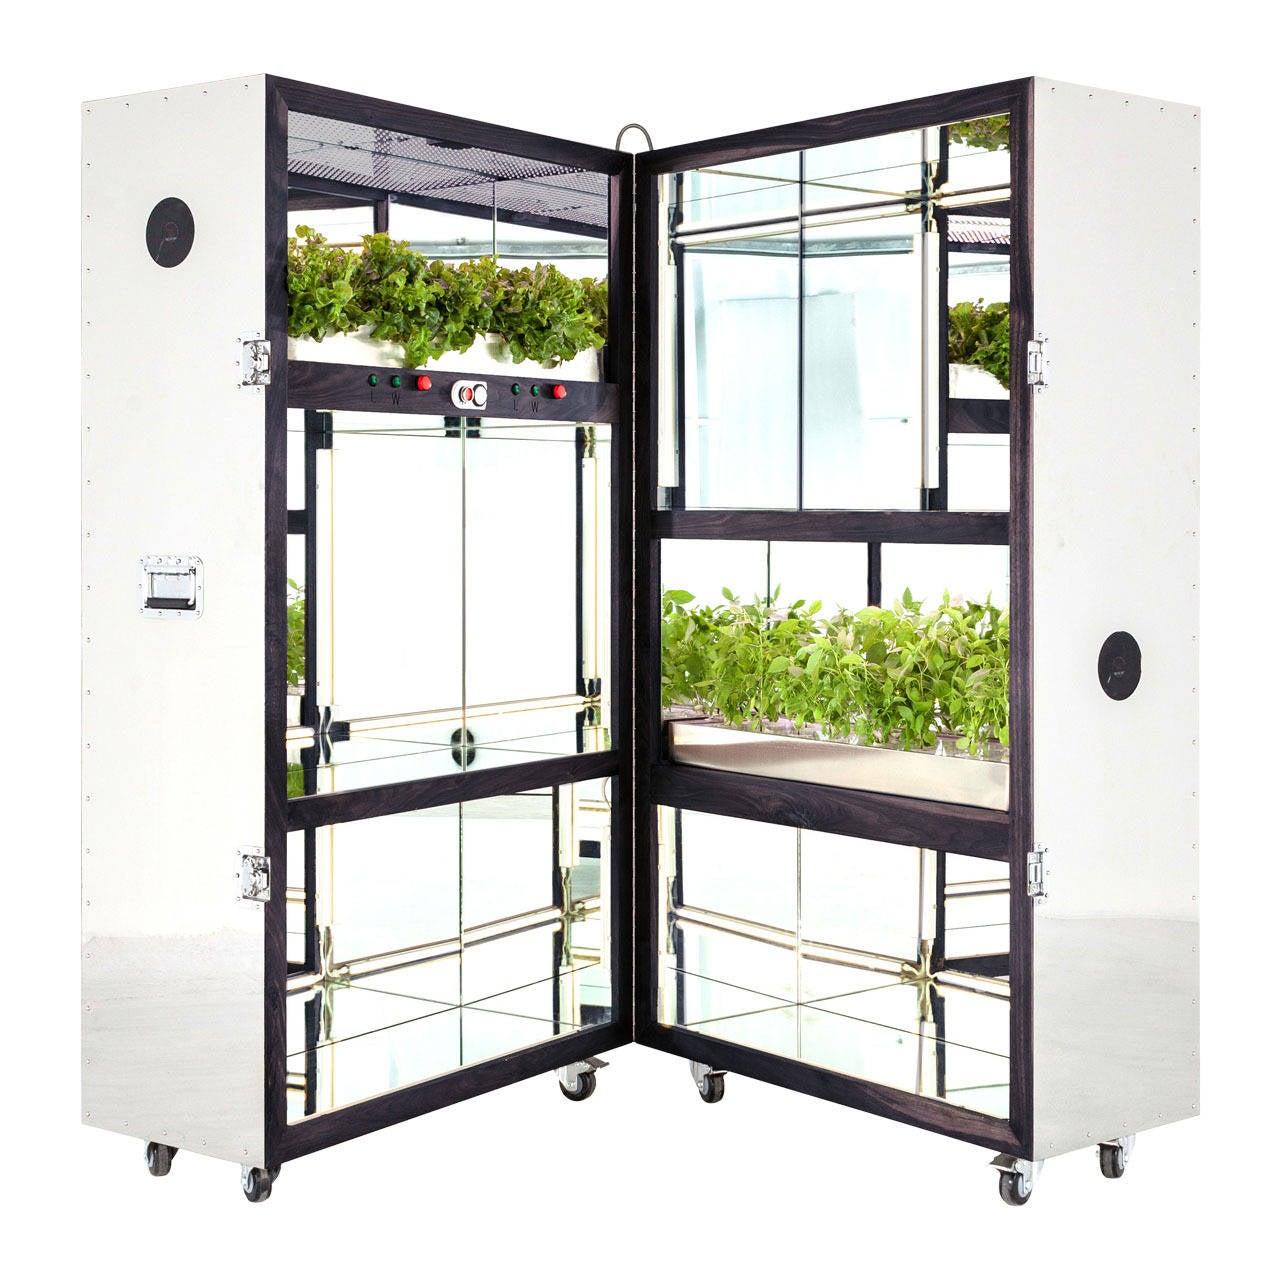 Hydraulic Shelf Kitchen : Expandable bag shelf with hydraulic garden in walnut and